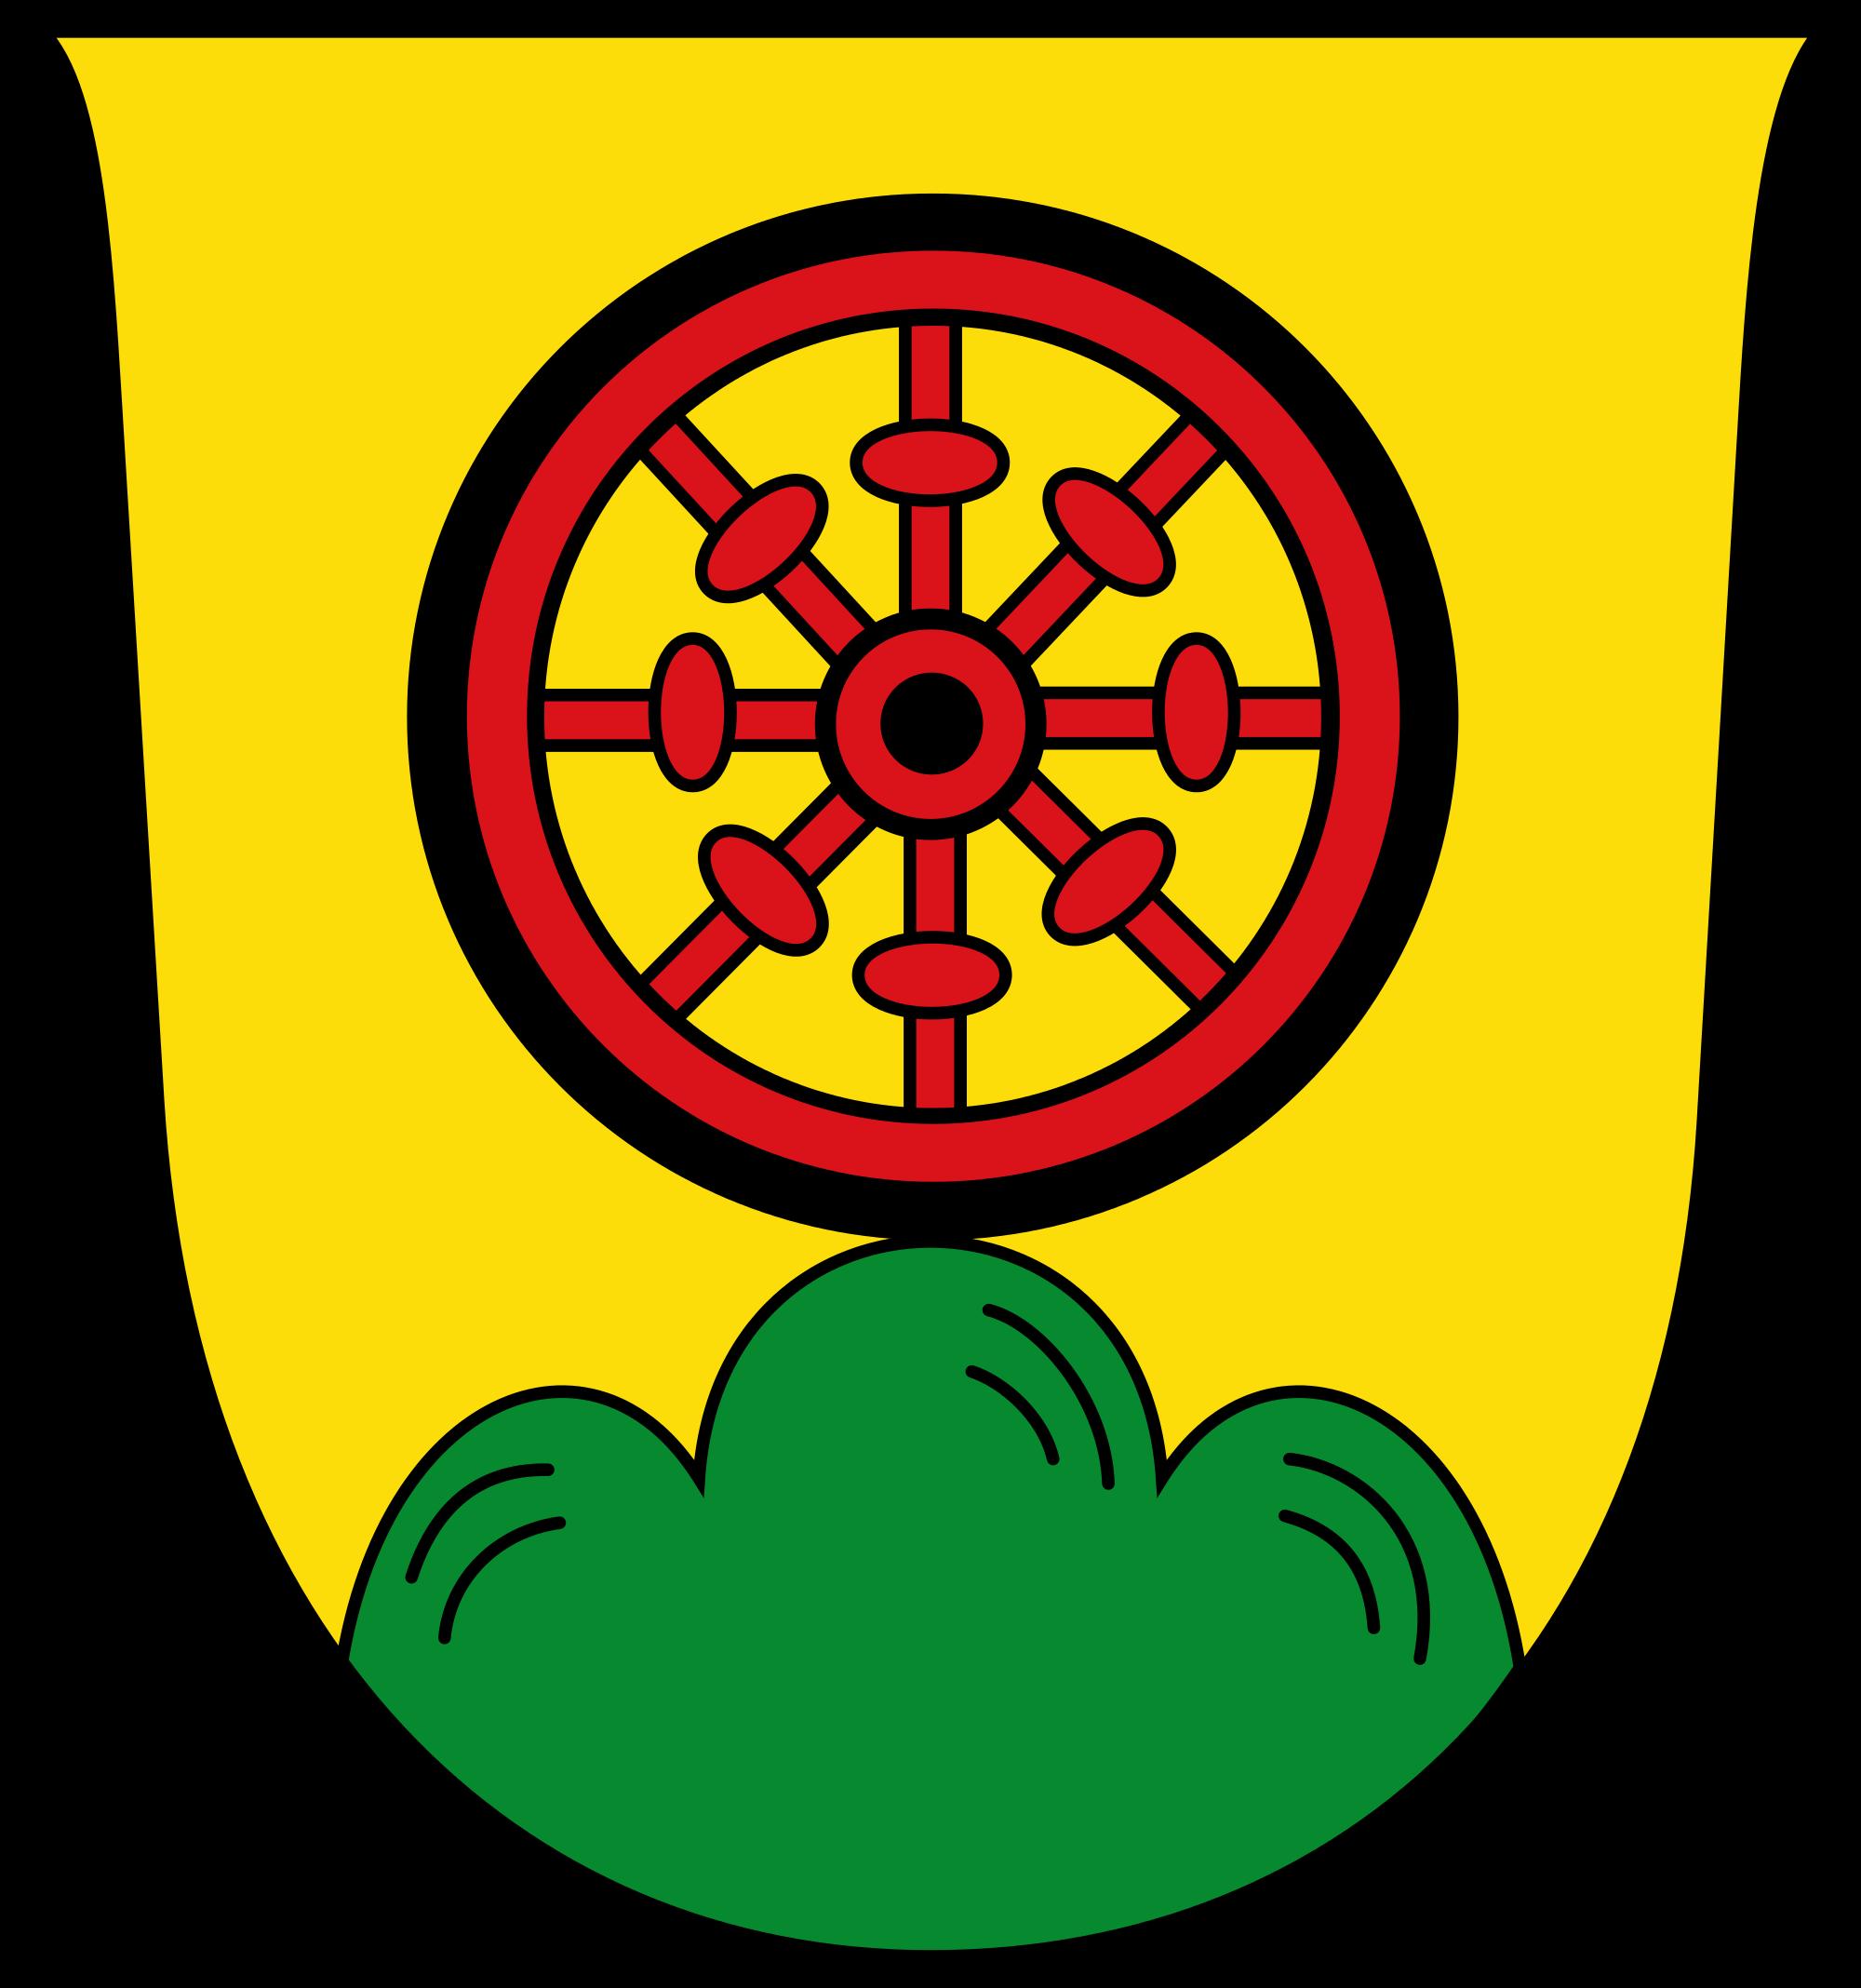 File:AUT Bergheim bei Salzburg COA.svg.